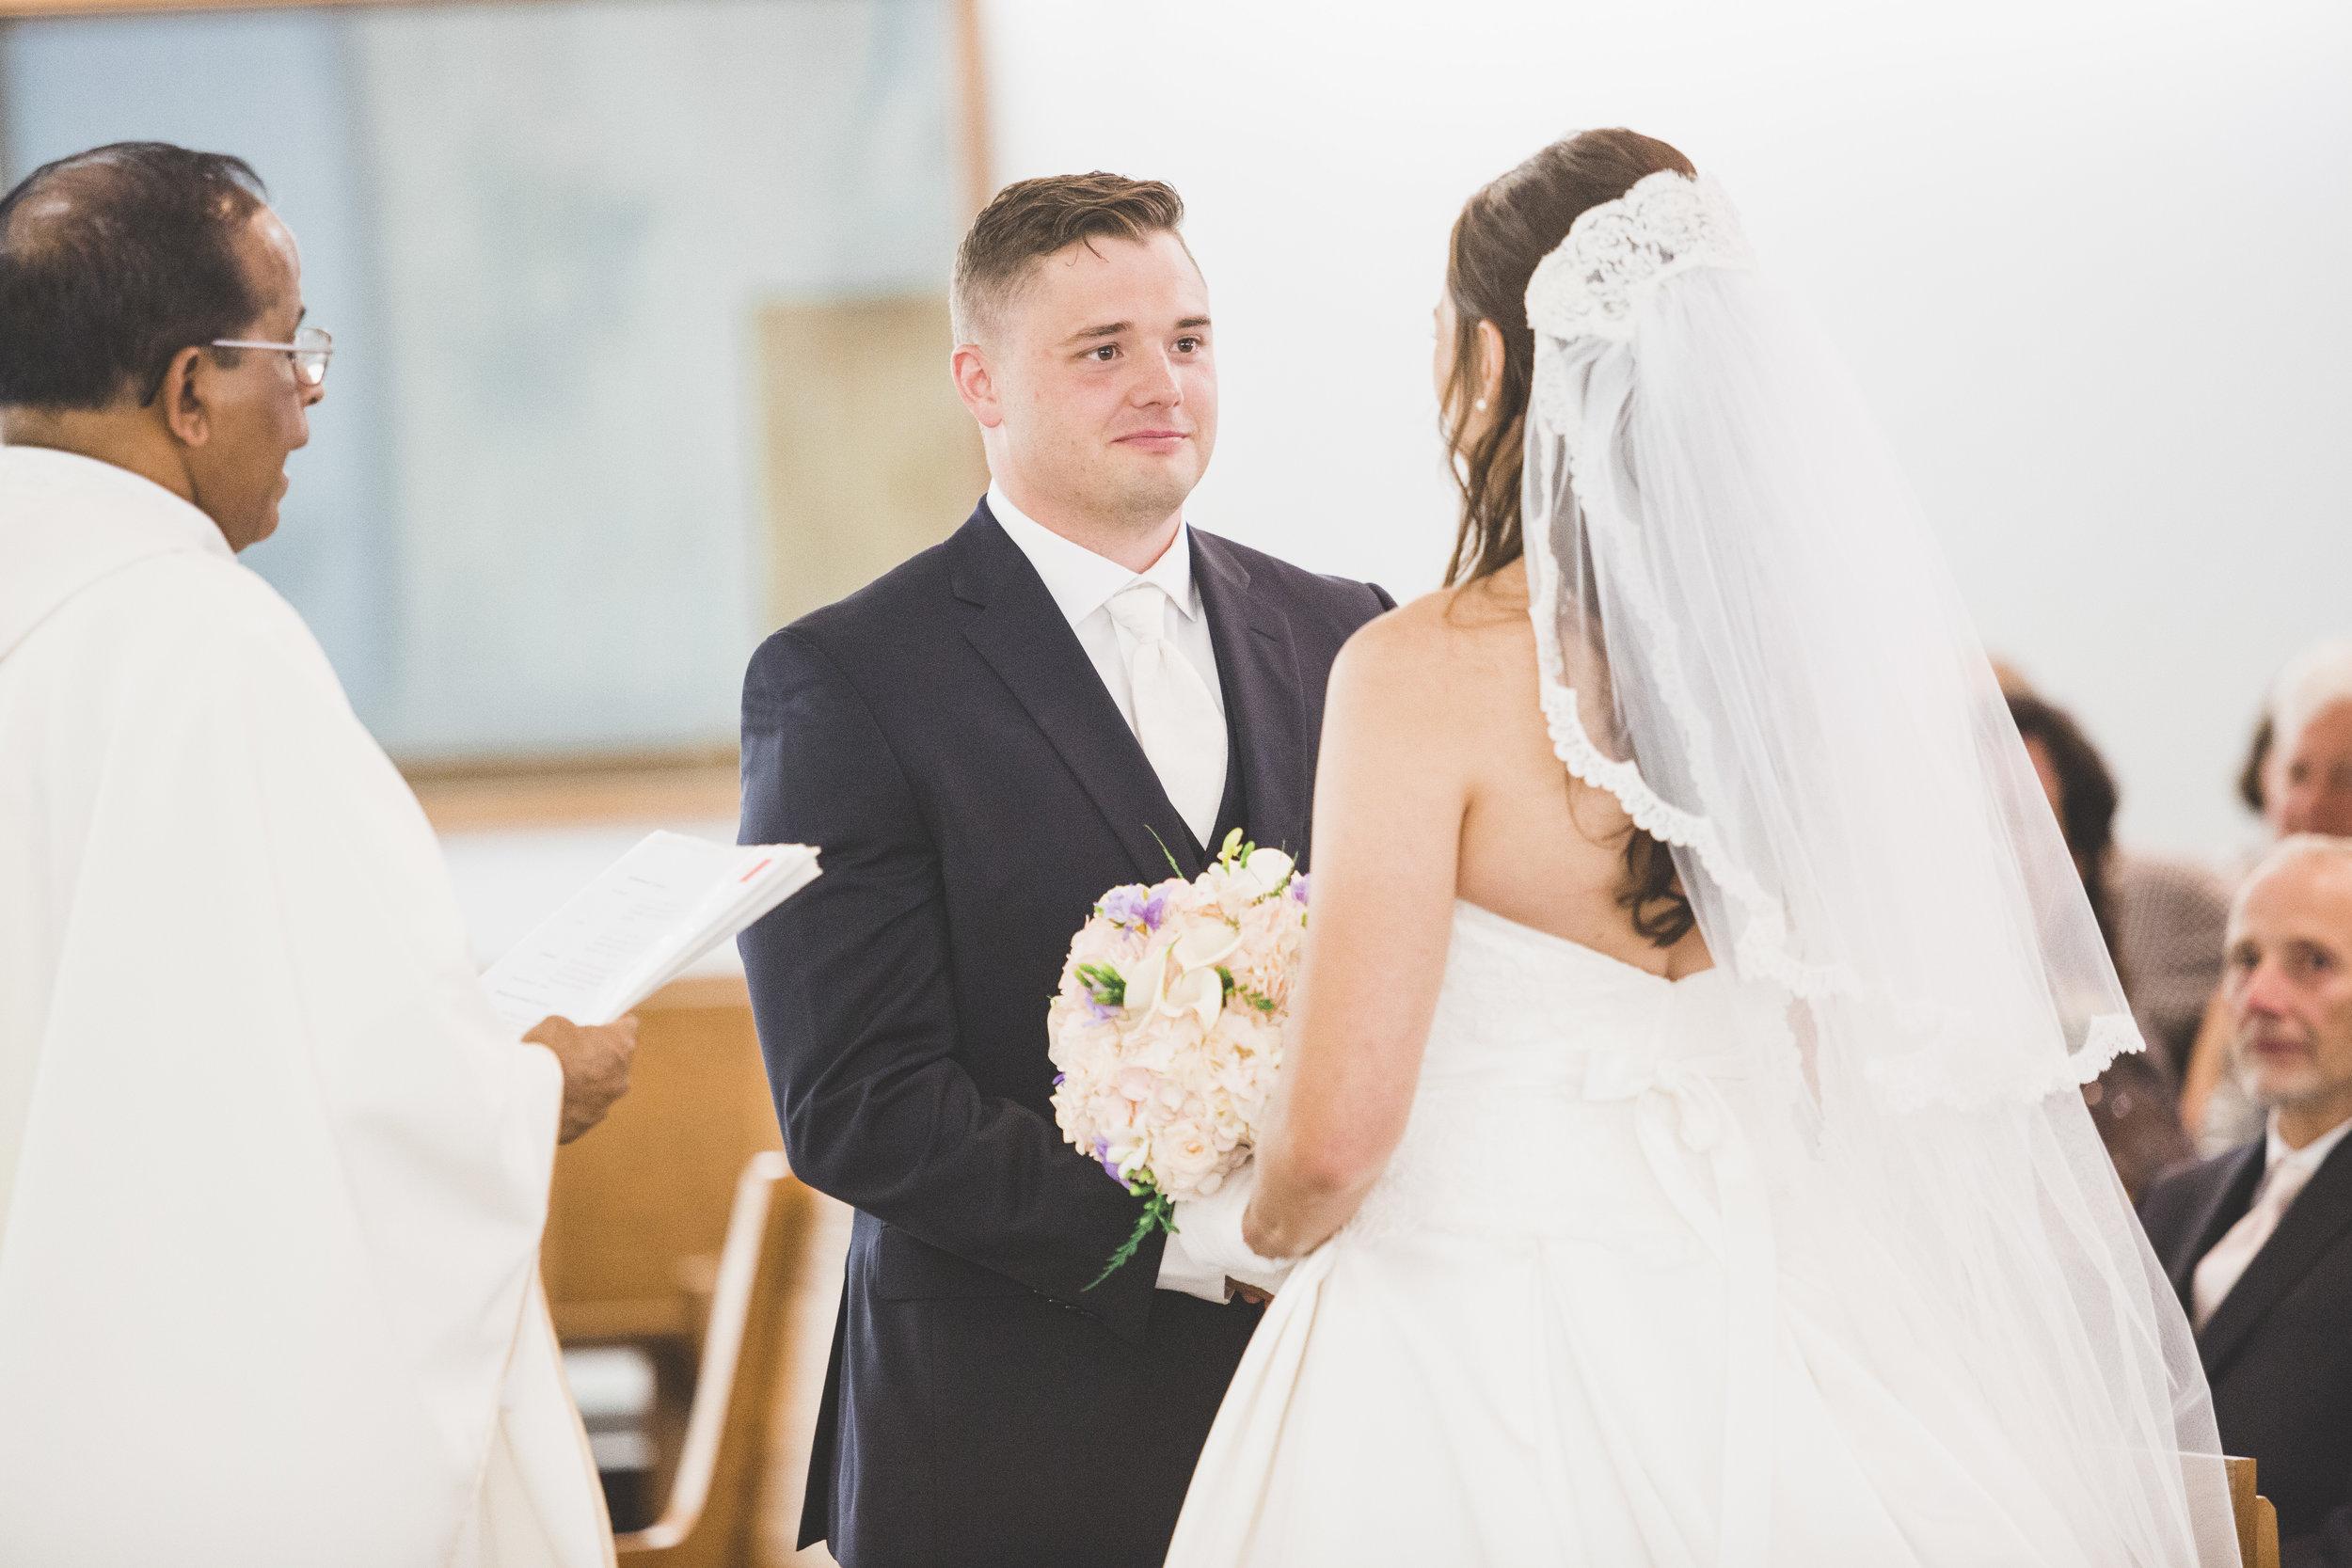 Wedding ceremony in Kincardine